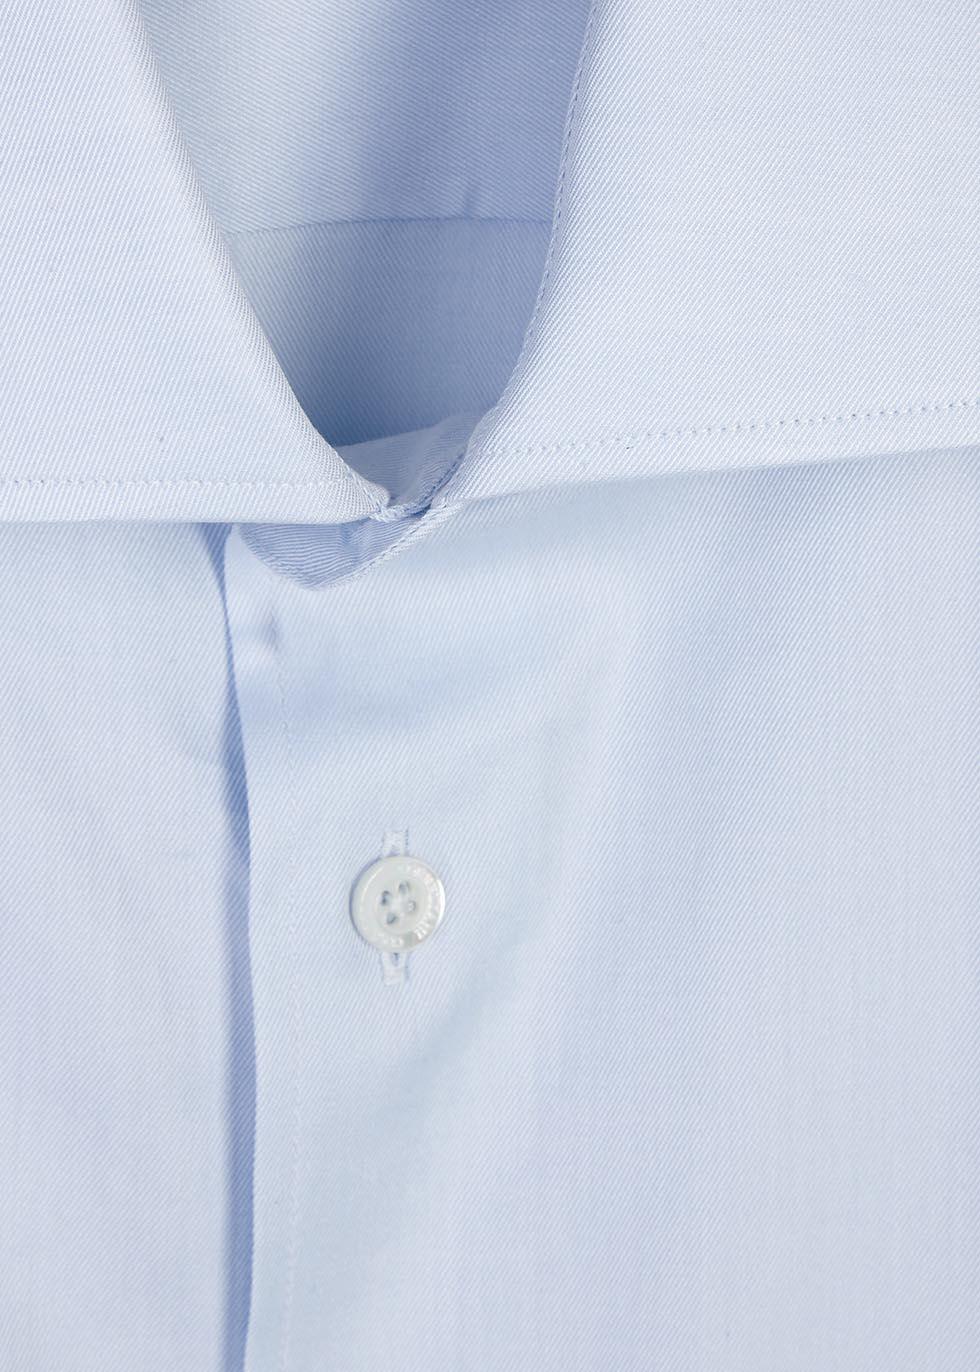 Light blue cotton shirt - Corneliani